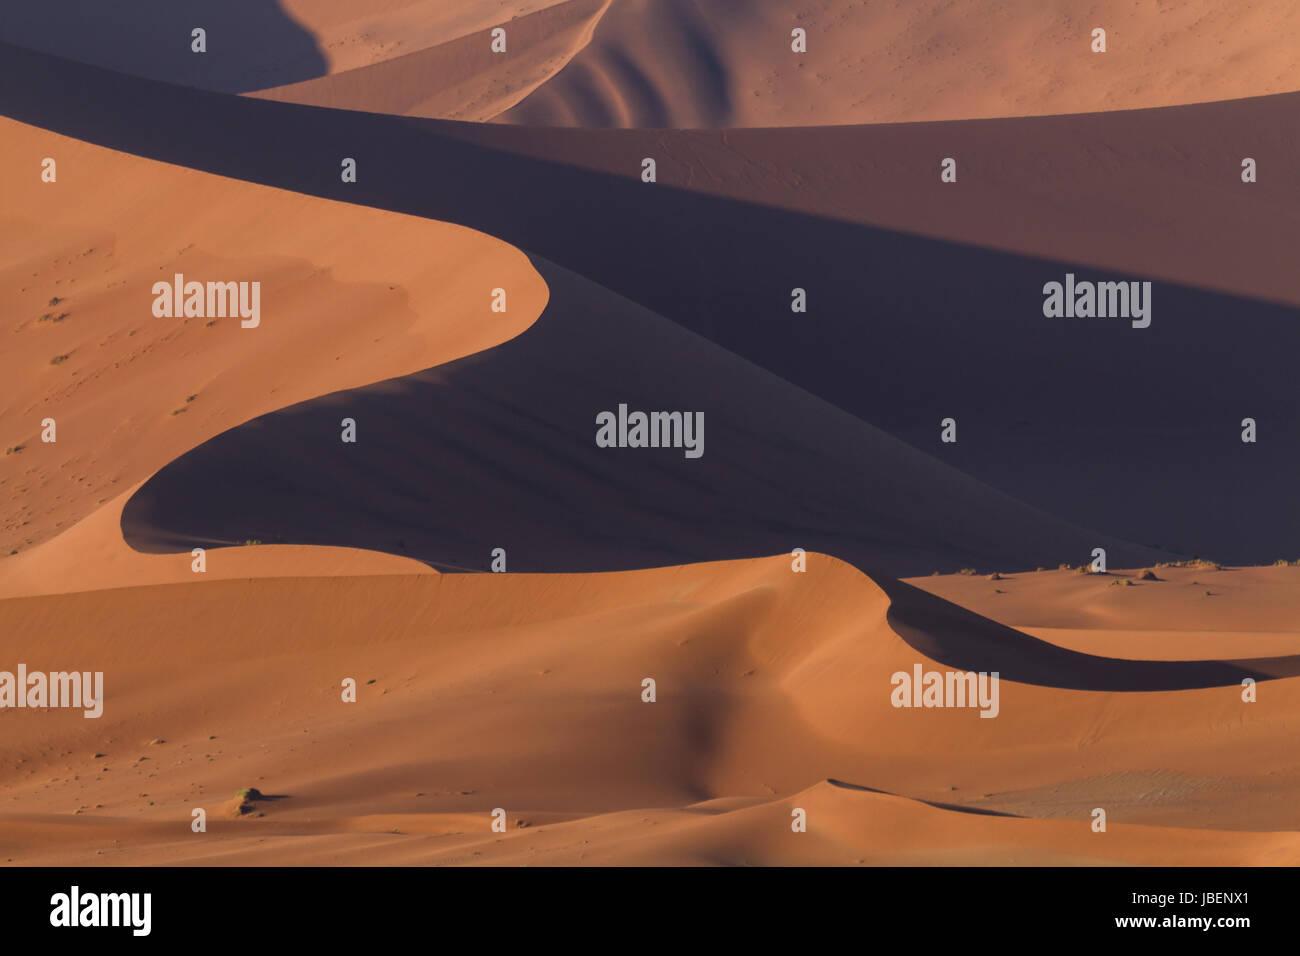 Waves of ornage dunes at Sossusvlei, Namibia, Africa - Stock Image